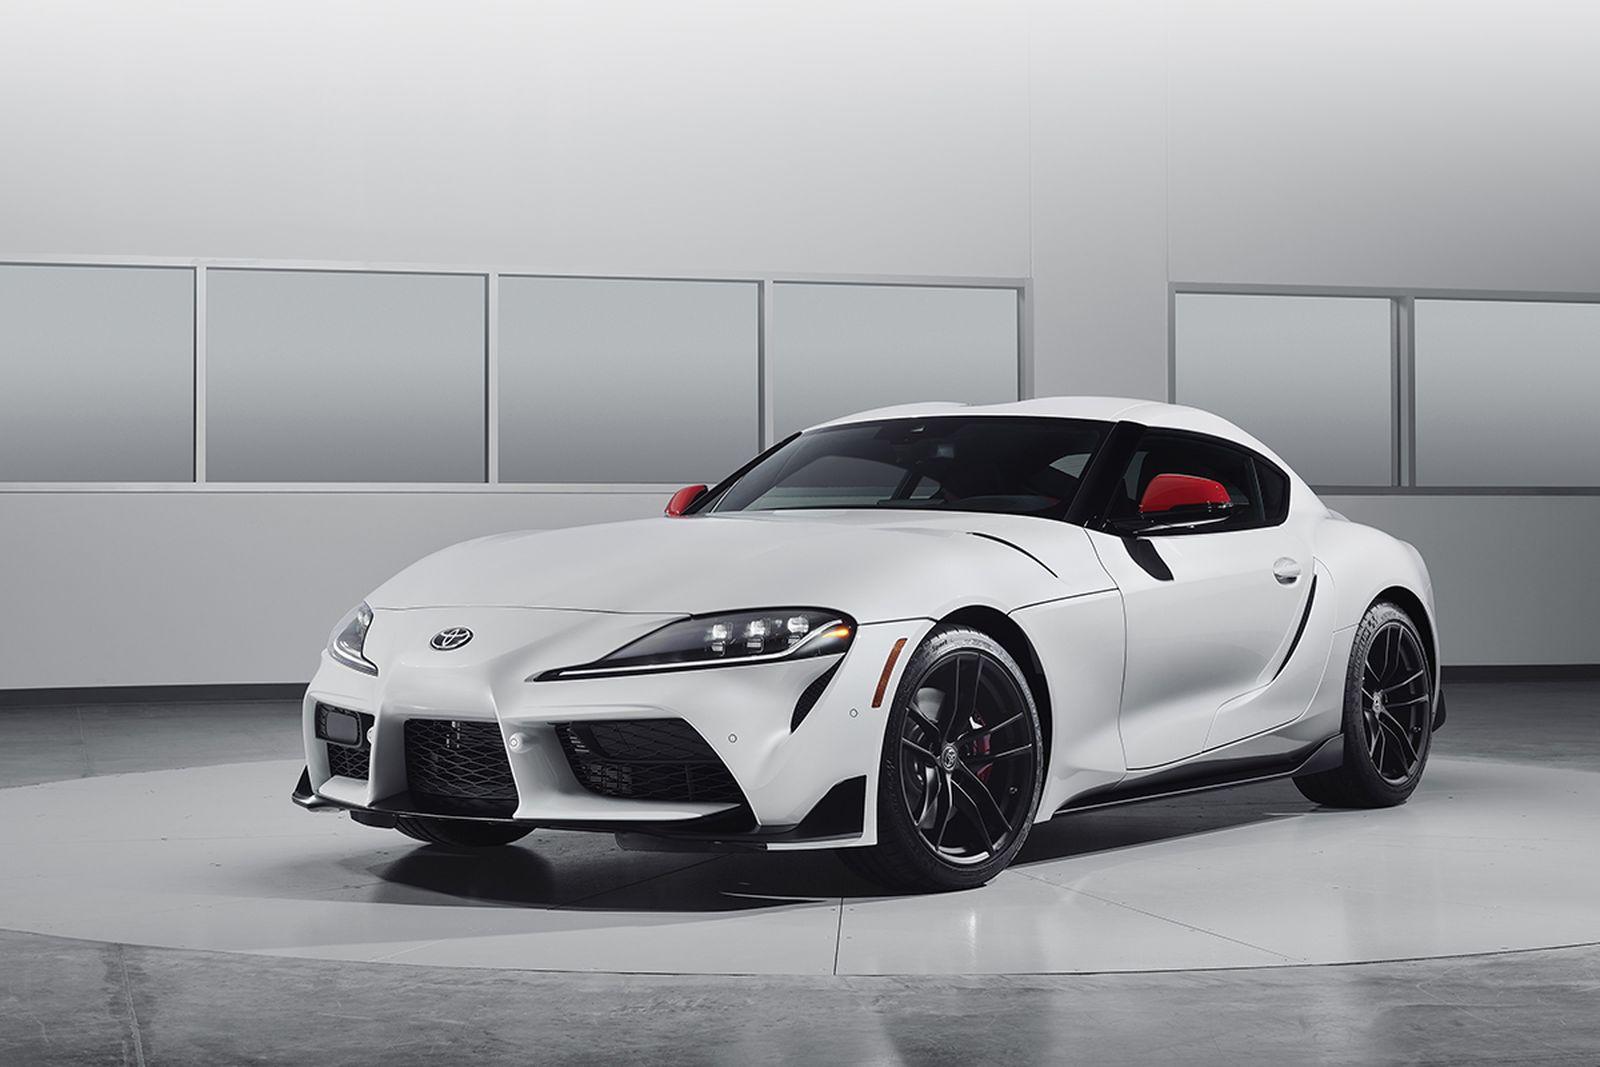 toyota supra 2020 Inifiniti Lexus detroit auto show